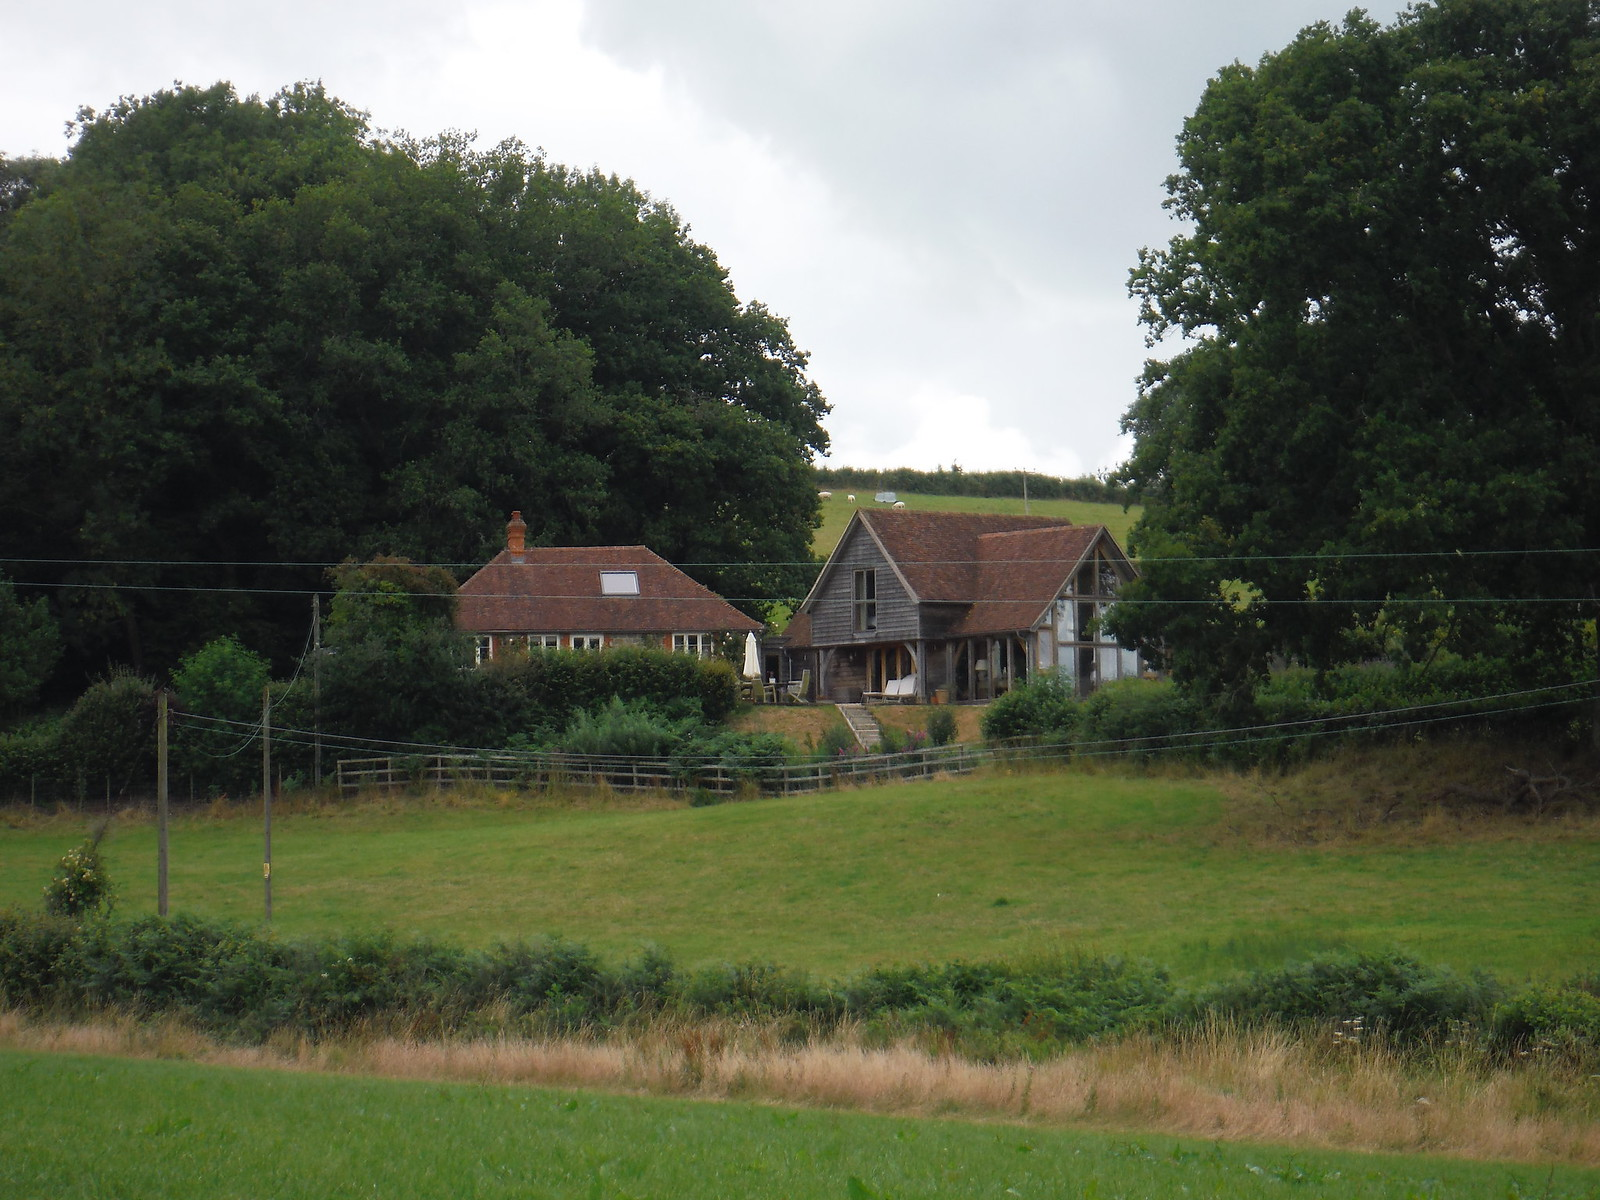 Converted Farmhouse, Pigthrough Lane SWC Walk 252 Tisbury Circular via Donhead St. Andrew